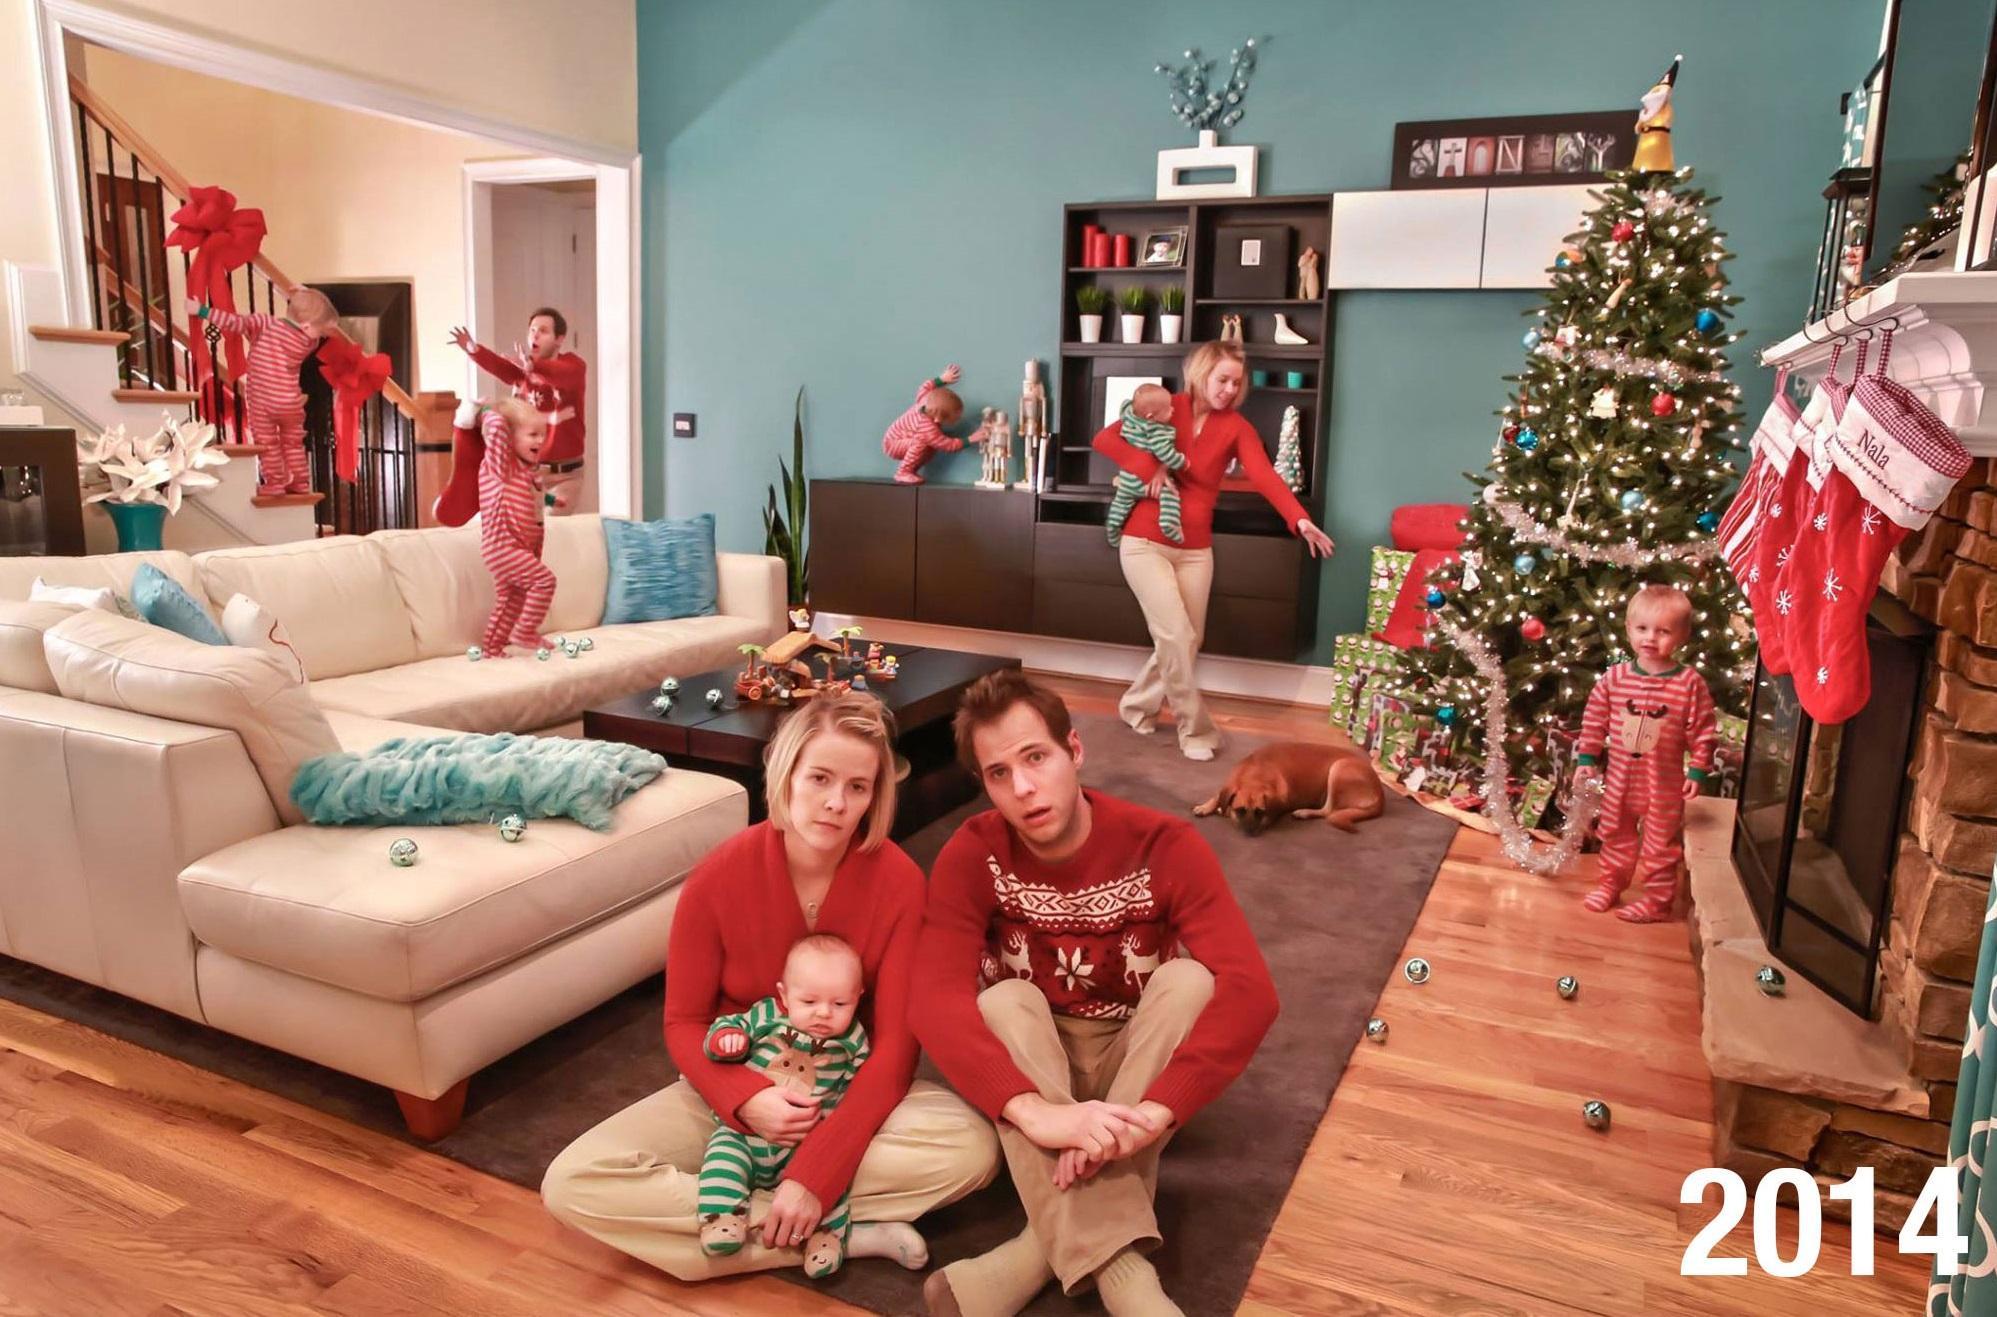 real-family-christmas-cards-6-1544816692353.jpg